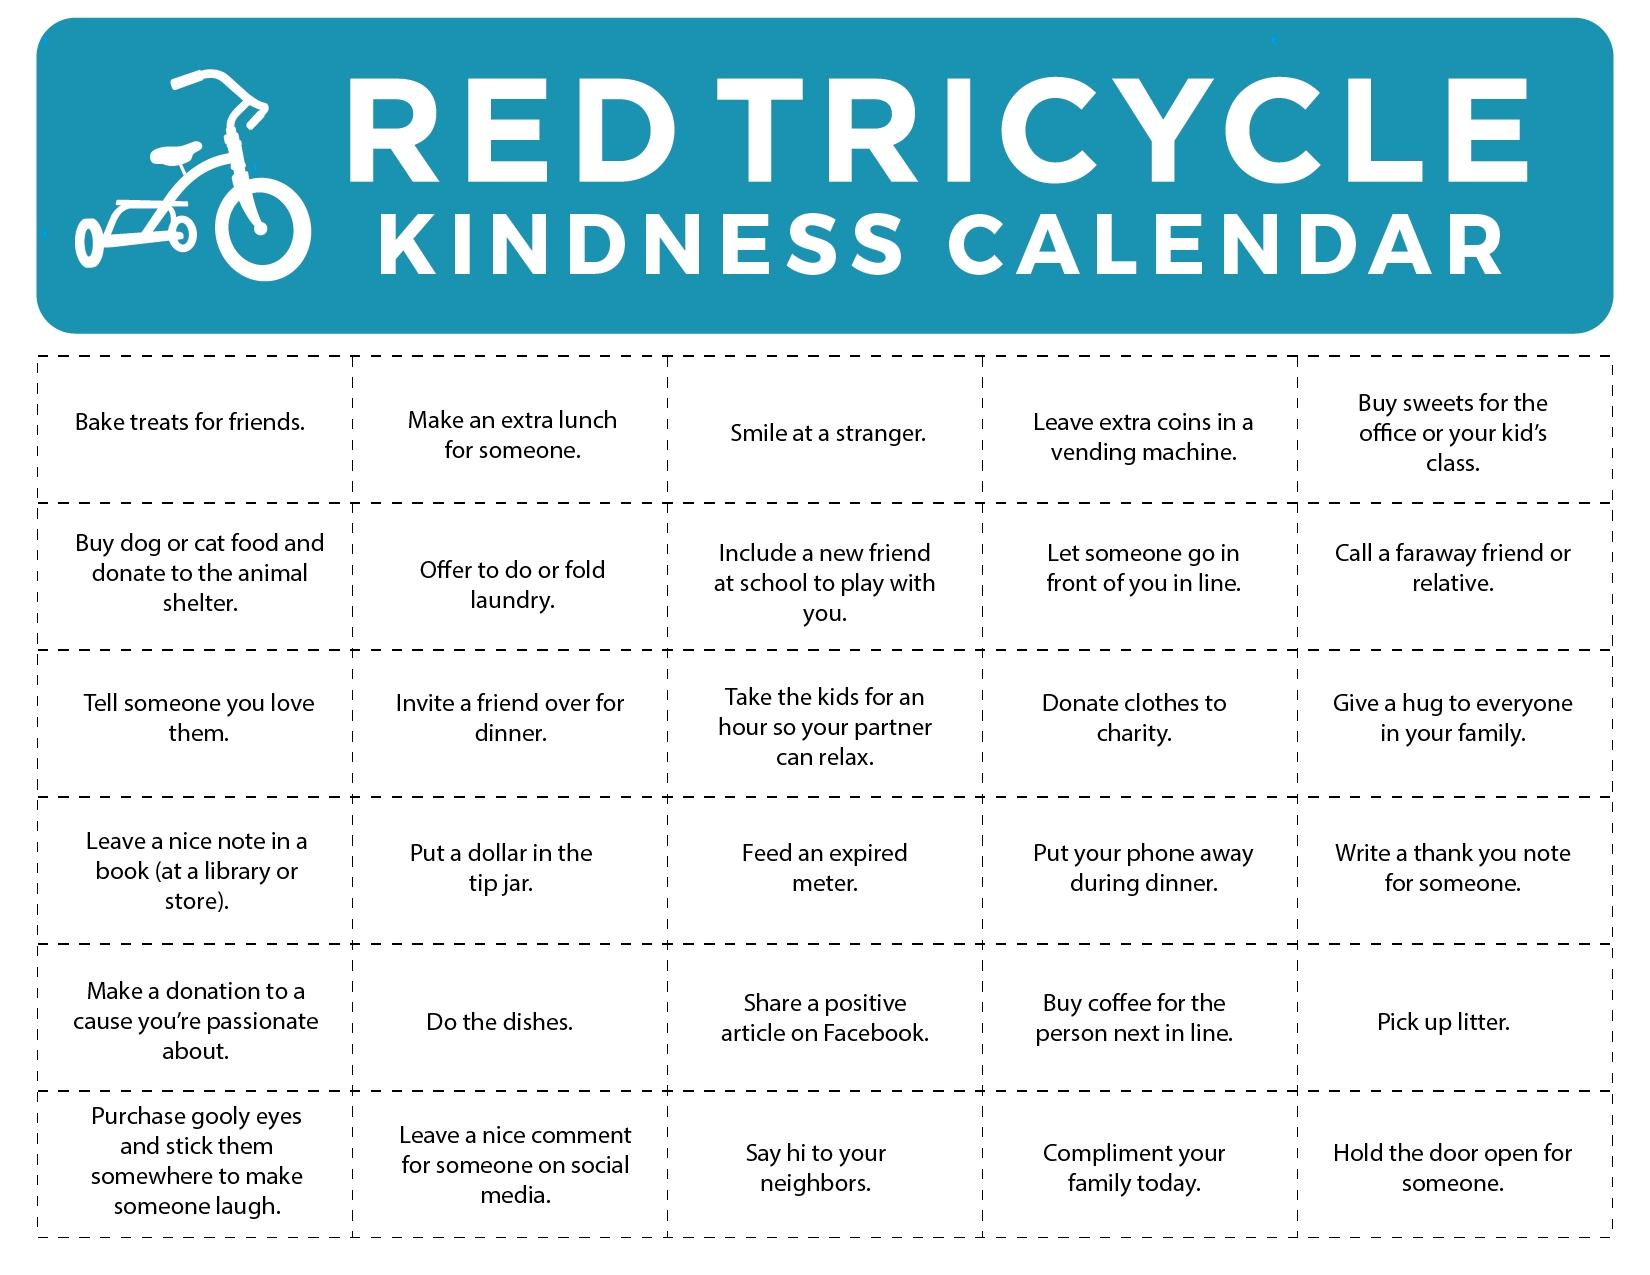 Download Our Kindness Calendar!